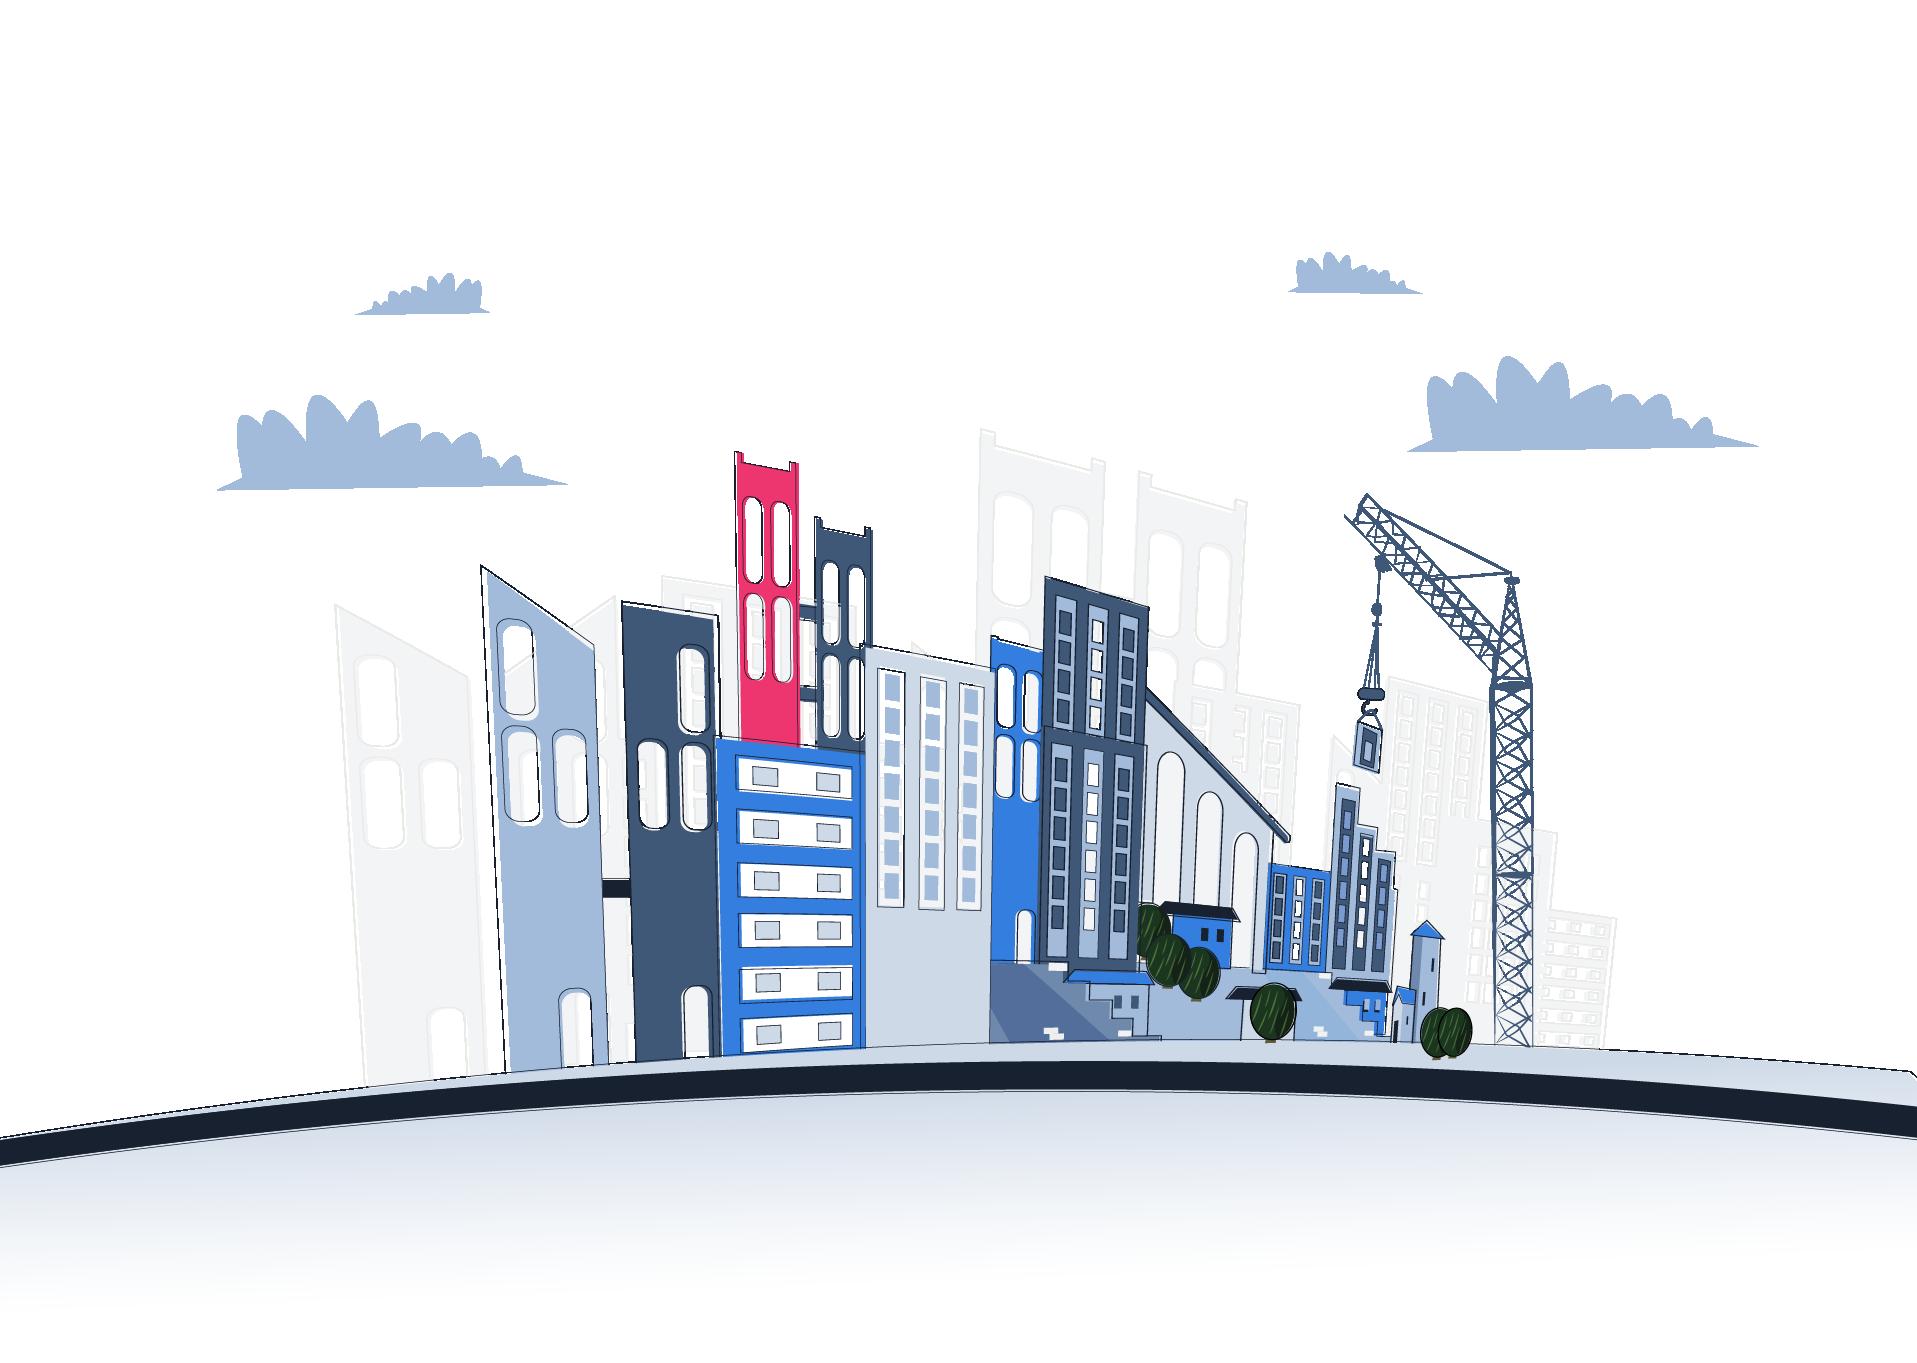 Qobrix Real Estate Software graphic representation